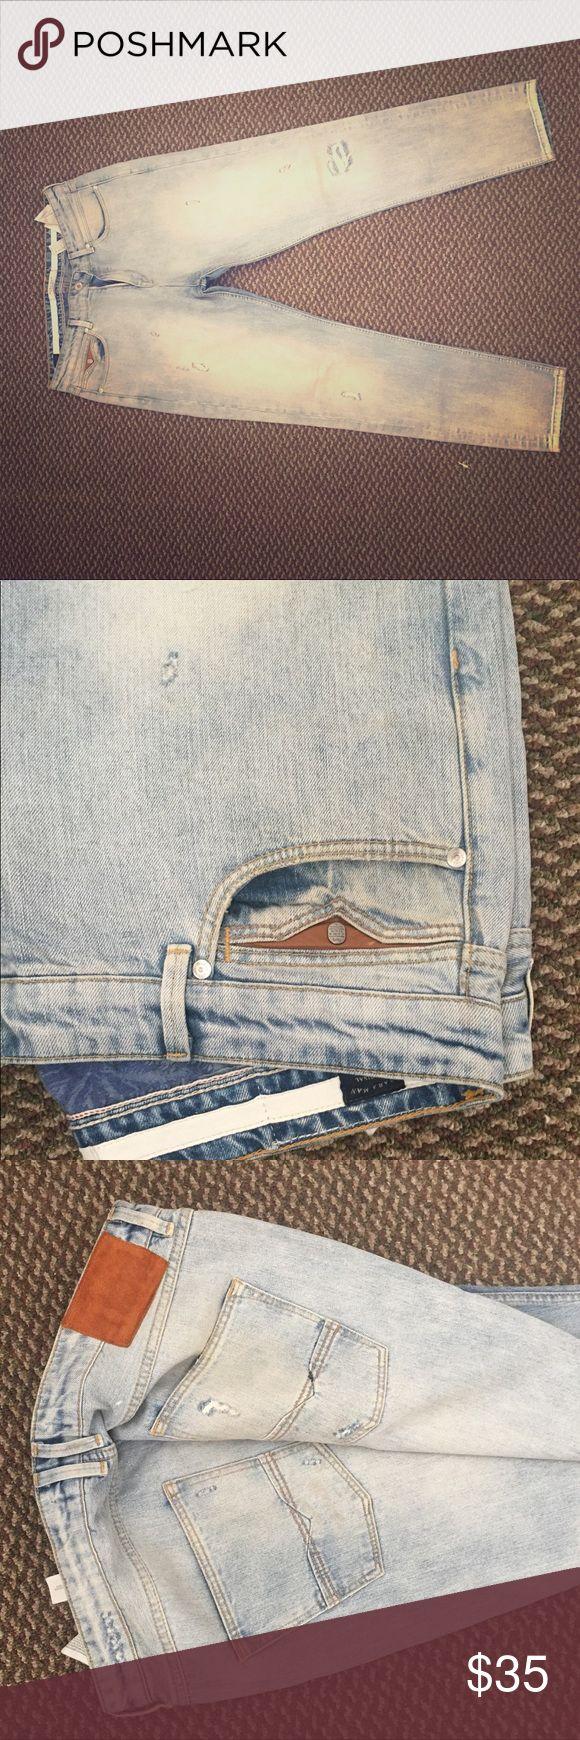 Zara Men's Jeans SZ. 36x32 Used Ice Blue Jean with Tan fade Zara Jeans Slim